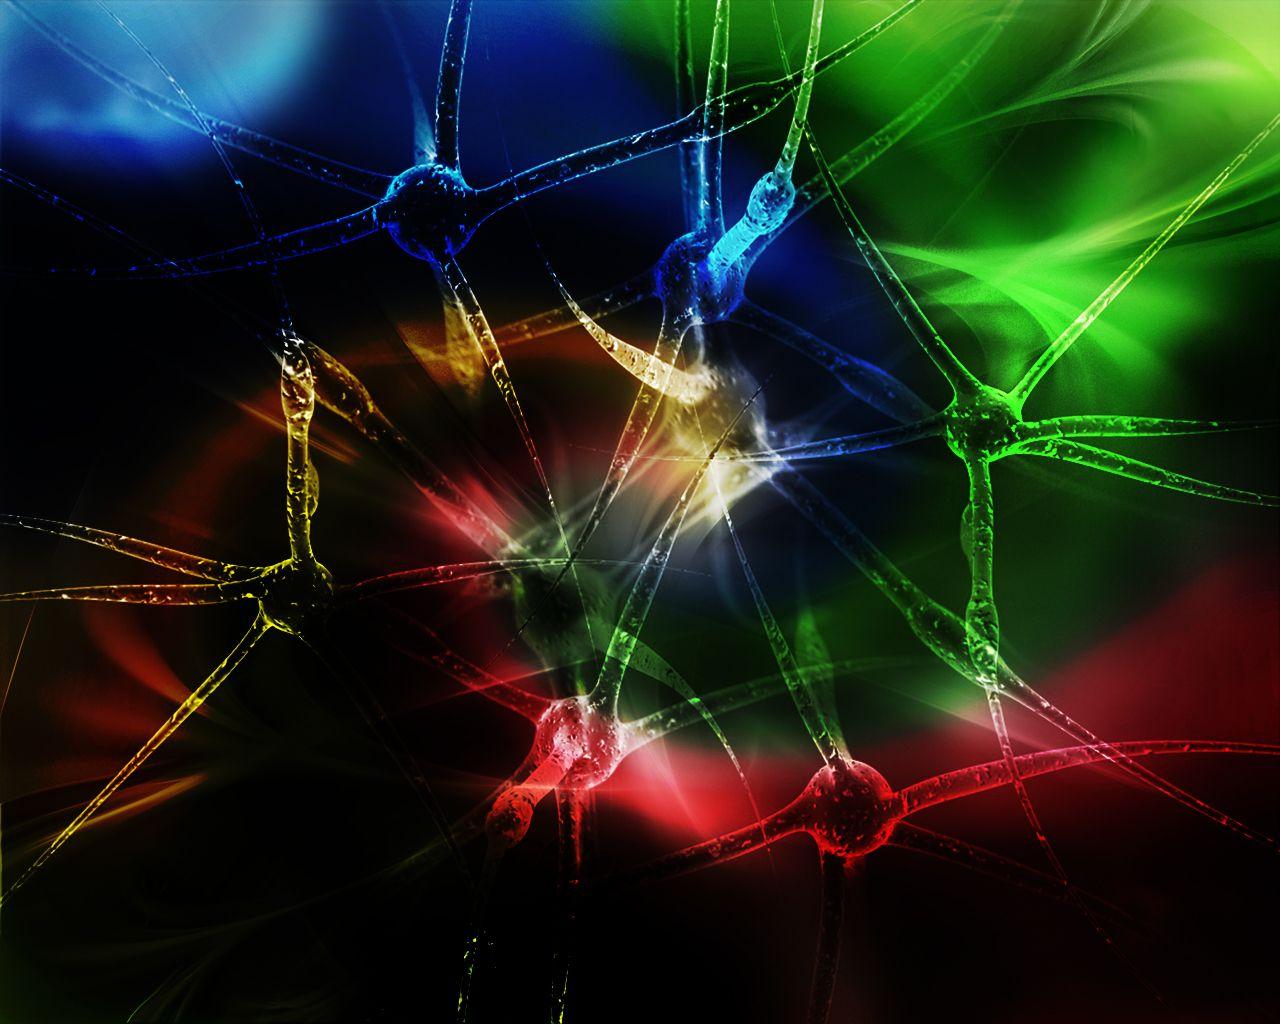 Google Image Result for http://www.crystalxp.net/galerie/img/img-wallpapers-power-of-photoshop-omohit-14774.jpg